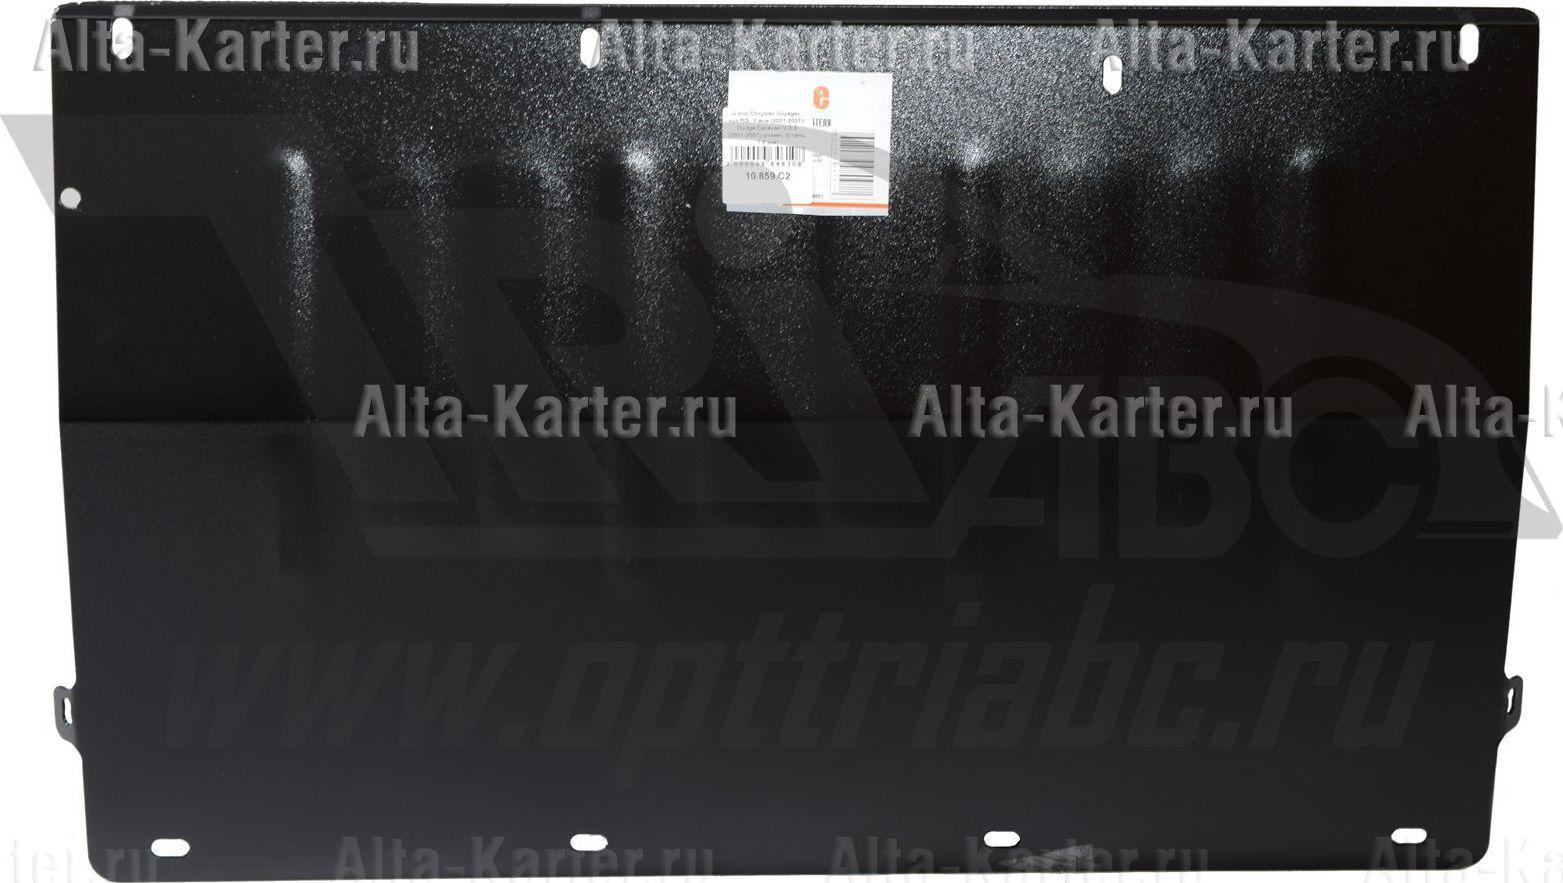 Защита Alfeco для картера и КПП Dodge Caravan IV 2001-2007. Артикул ALF.33.01